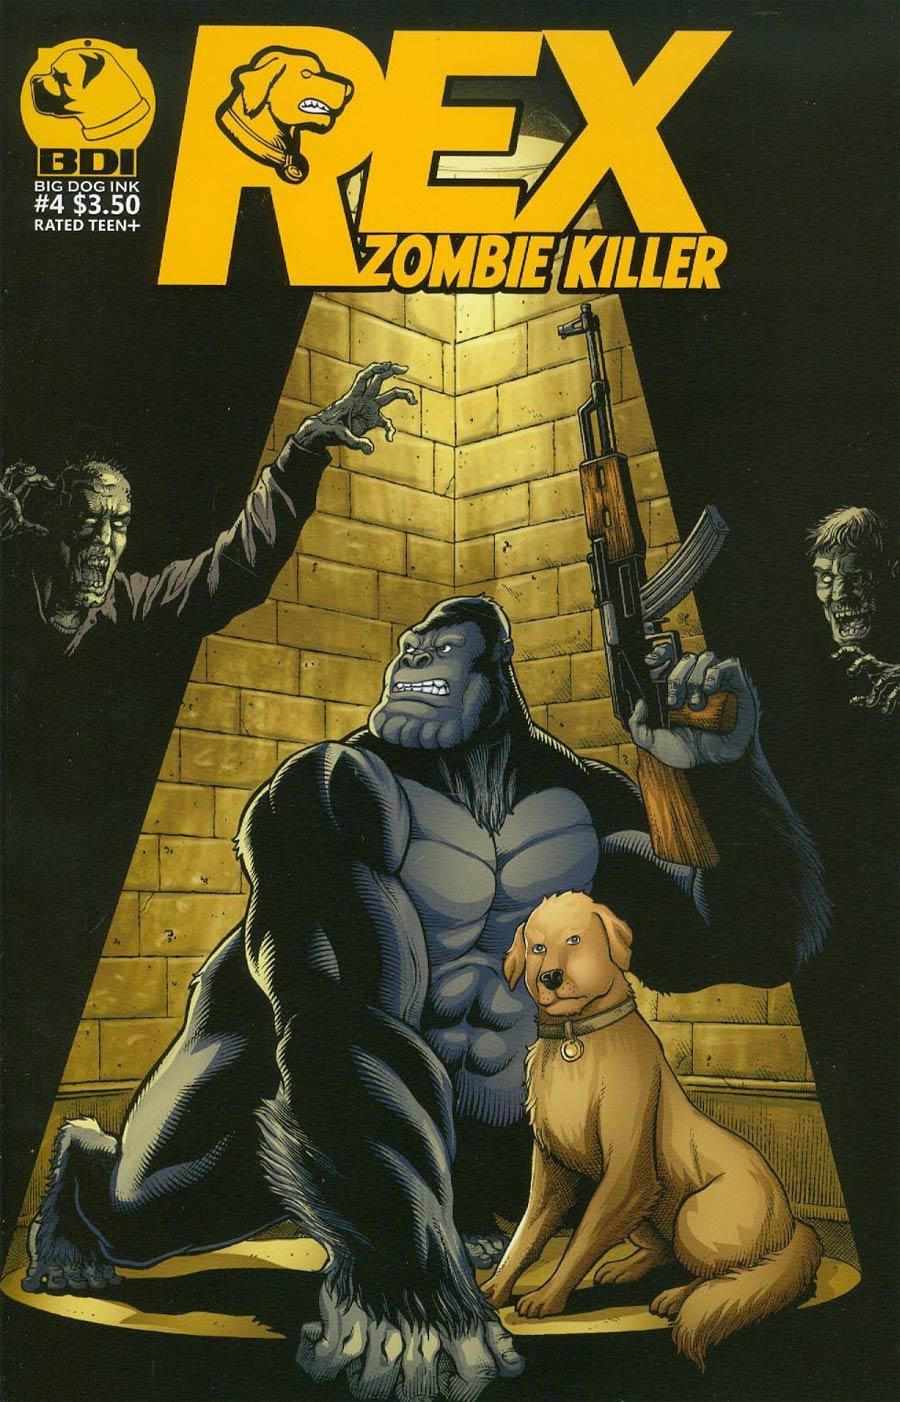 Rex Zombie Killer #4